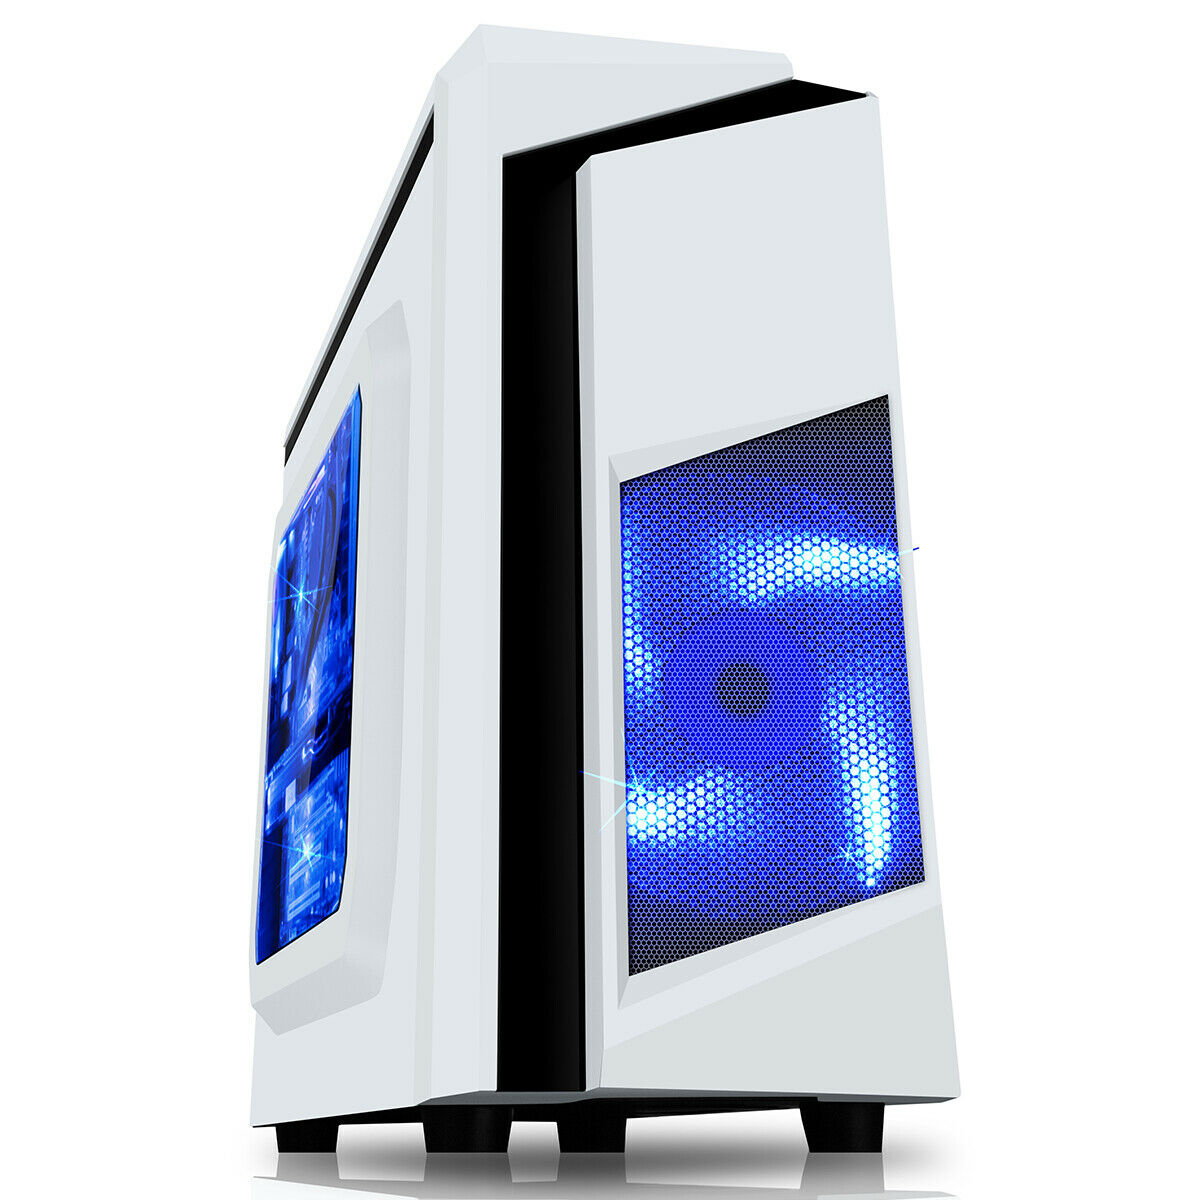 Computer Games - FAST DUAL CORE CUSTOM GAMING COMPUTER PC 8GB 500GB HDD GT 710 WIN 10 WIFI